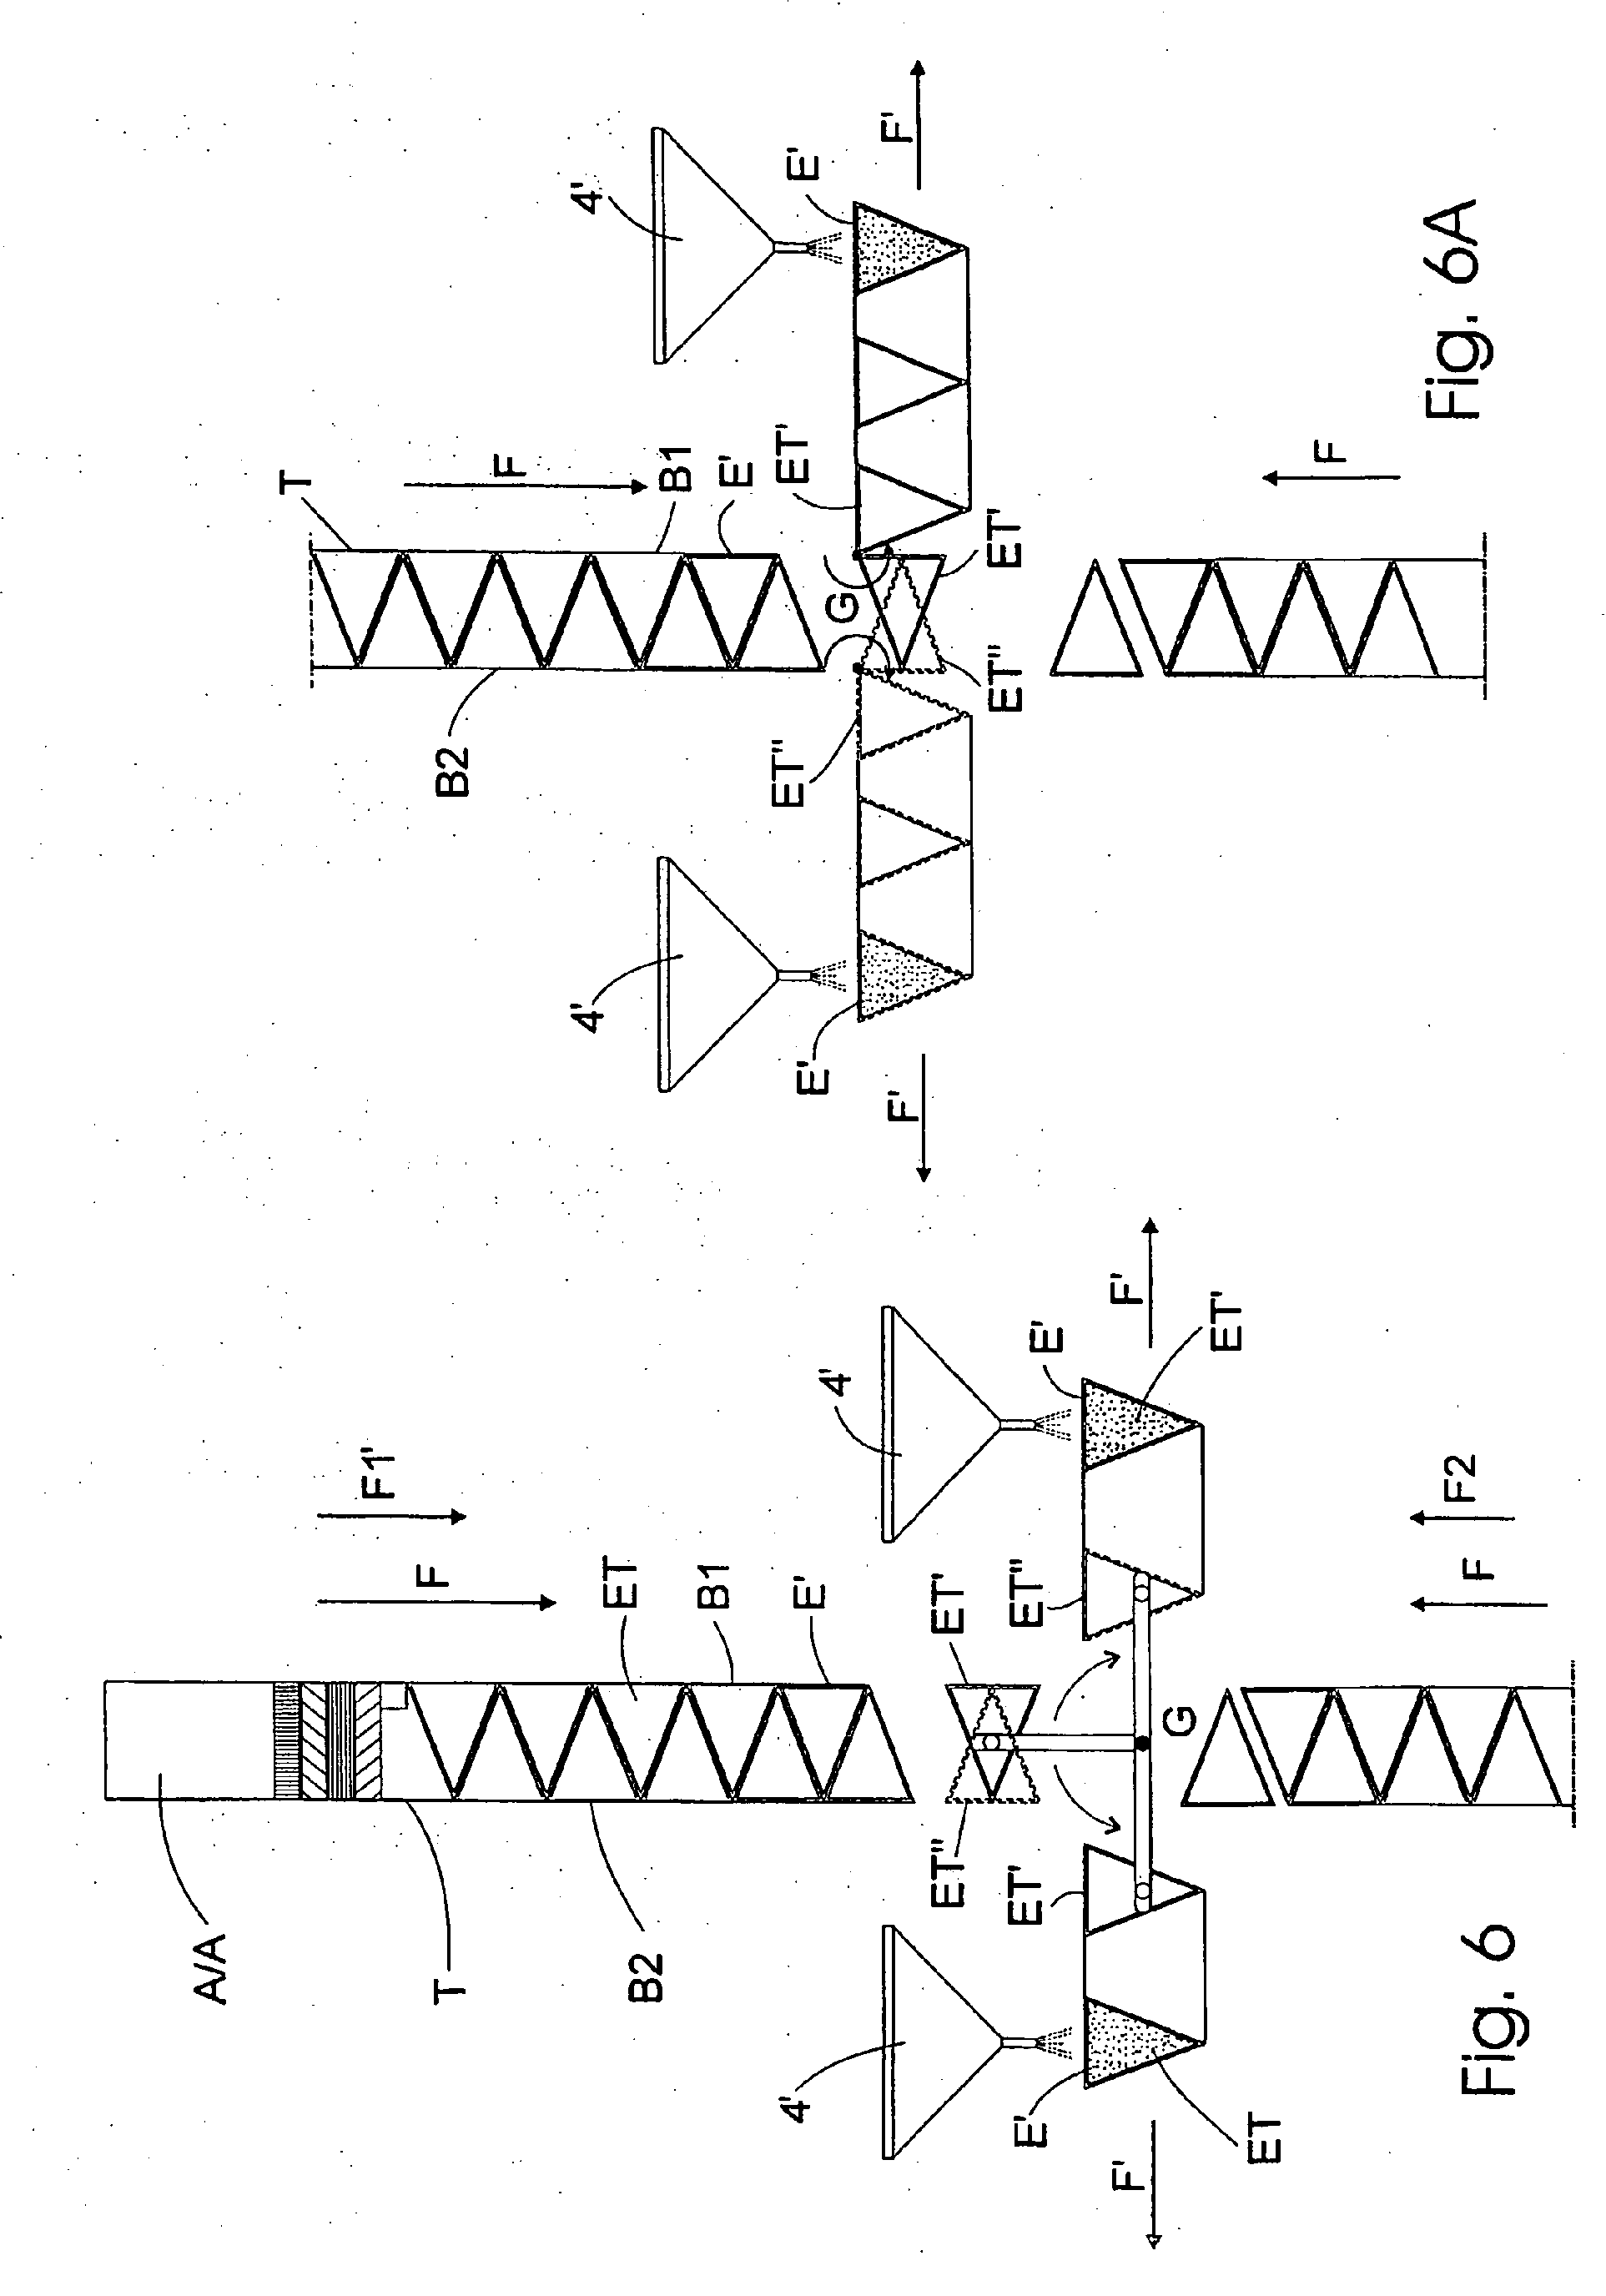 专利ep1669293a1 - machine